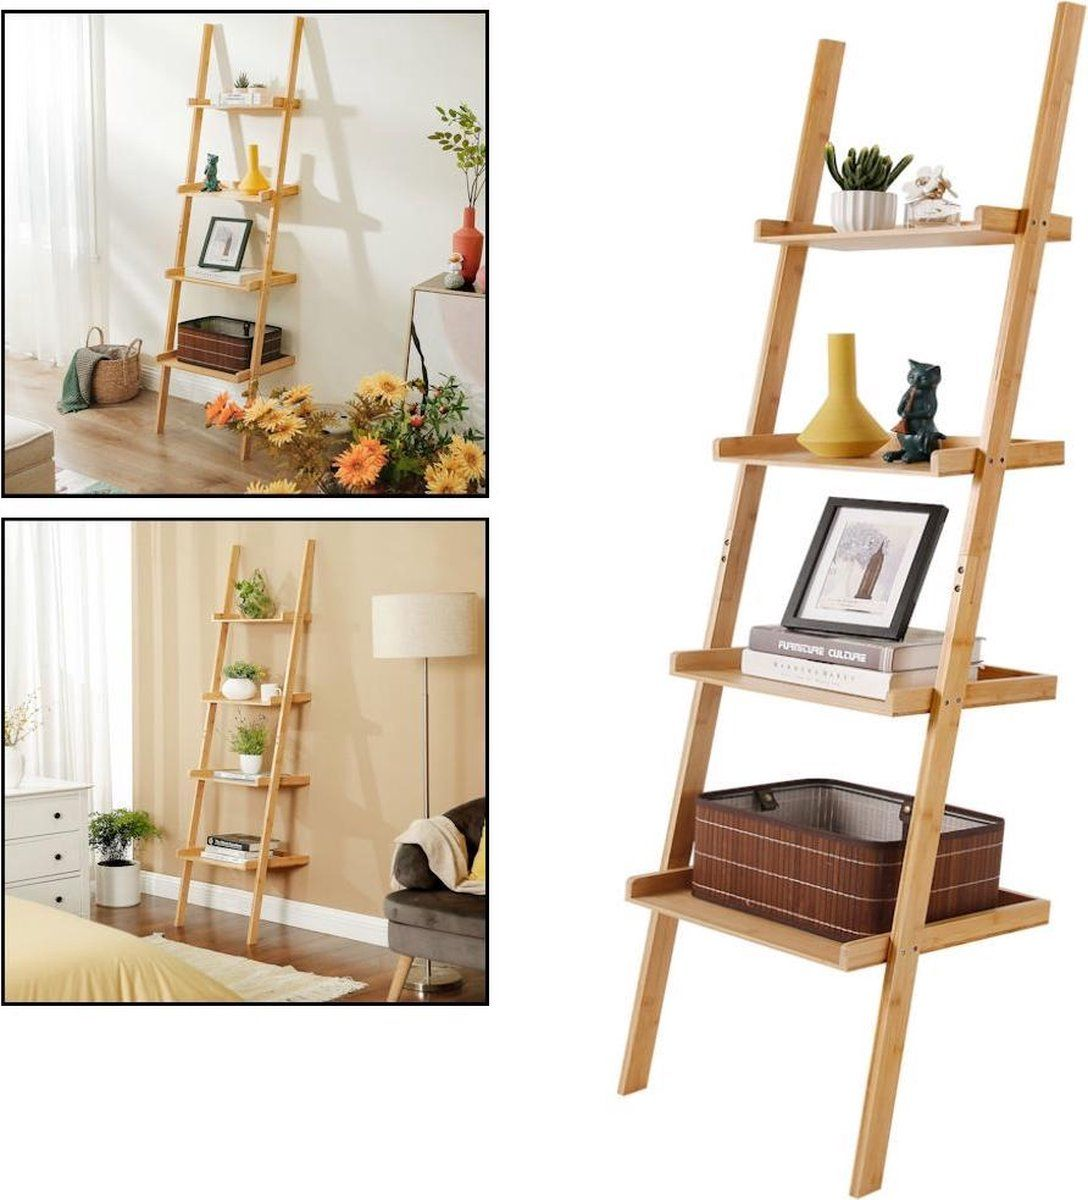 Decopatent Ladderrek Bamboe Hout Houten Decoratie Ladder Open Ladderkast Ladder In 2021 Decoratieve Ladders Bamboe Decoratie Thuisdecoratie